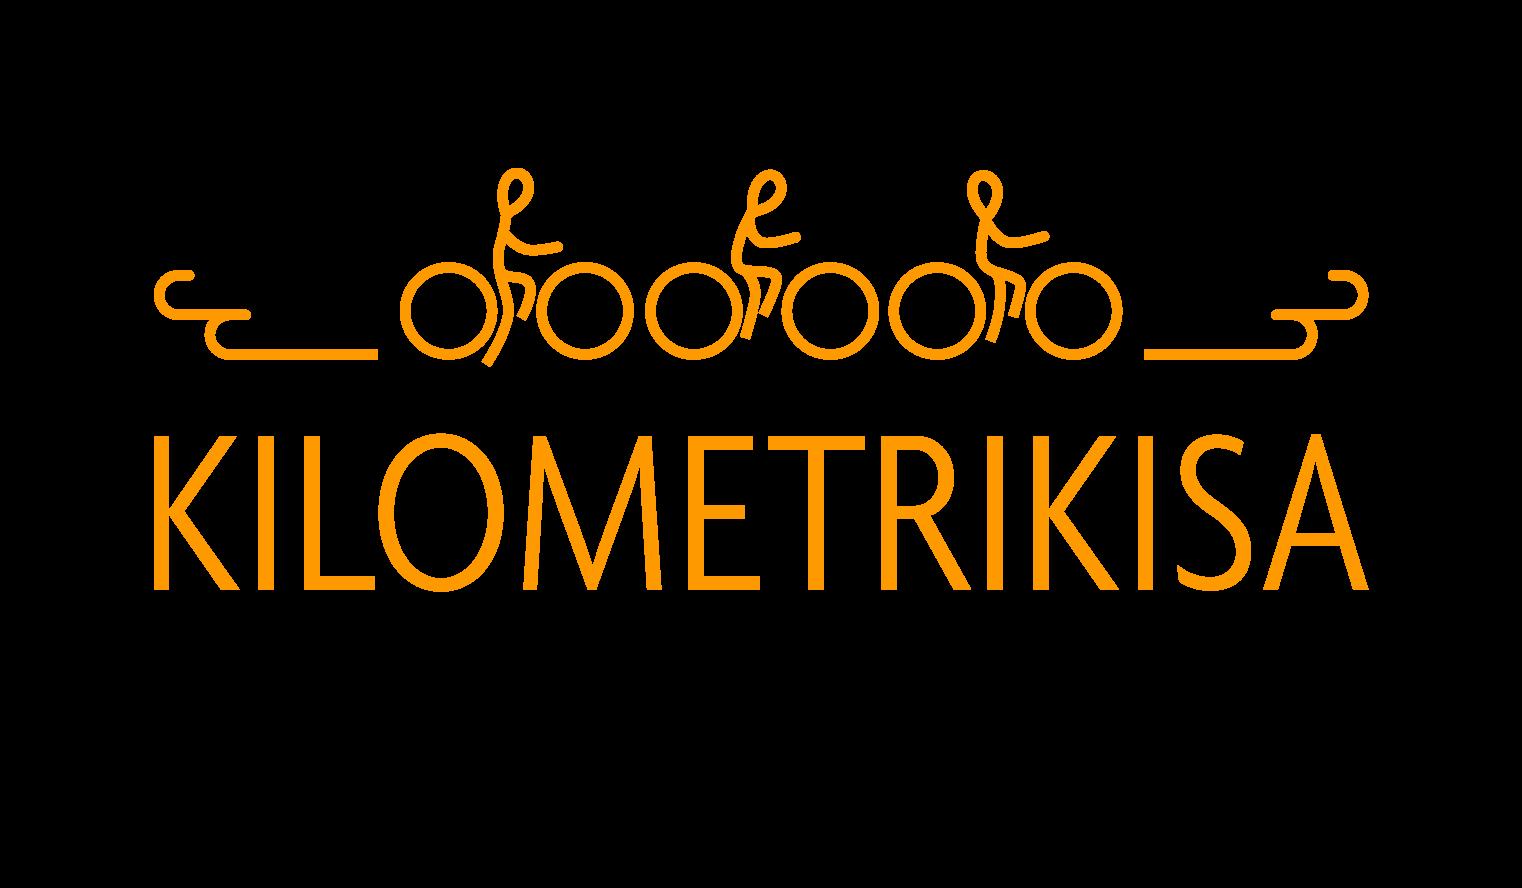 Kilometrikisa logo